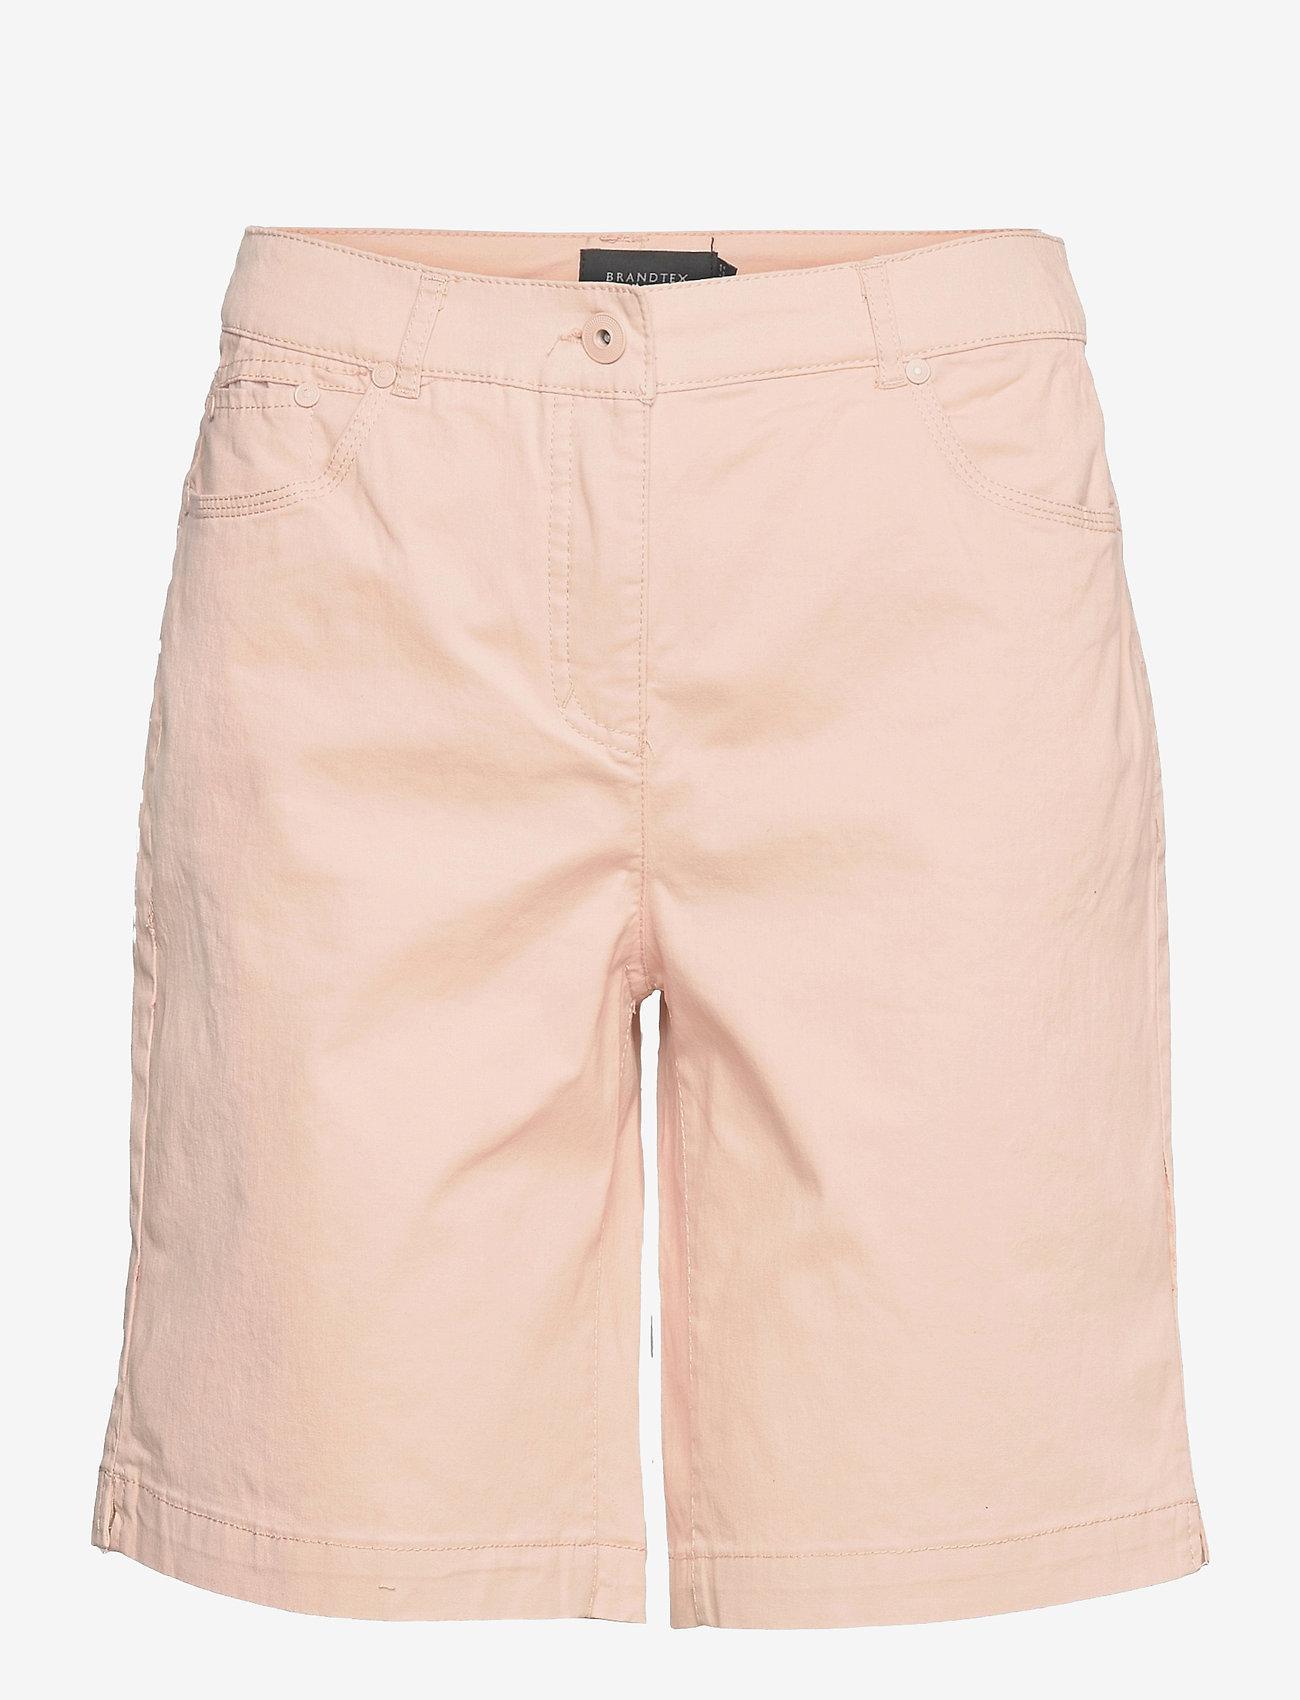 Brandtex - Casual shorts - chino shorts - pale blush - 0